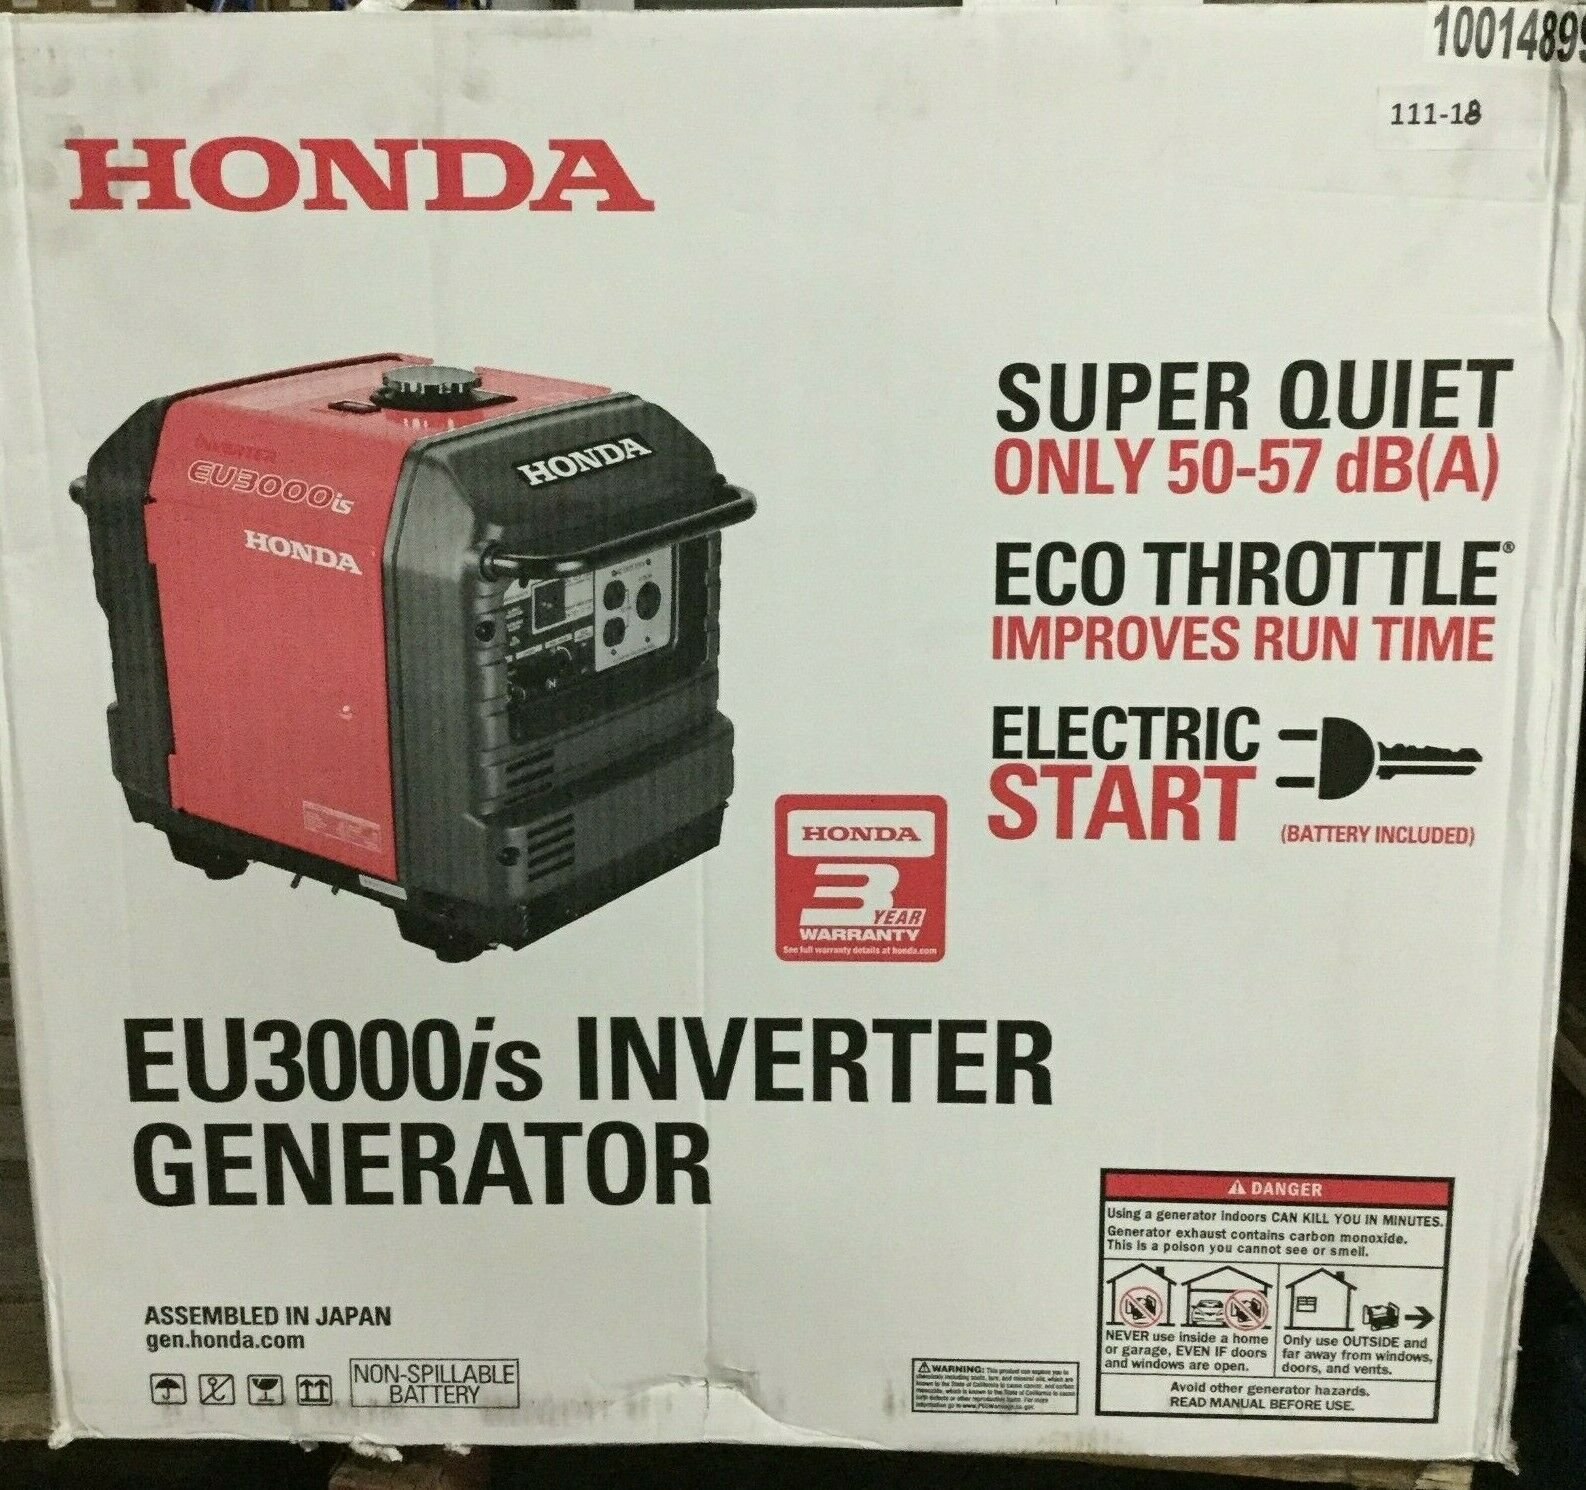 Honda Gas Inverter Generator Eu3000is 3000 Watt Portable Quiet Parallel Power 642554780658 Ebay In 2020 Inverter Generator Generation Power Generator